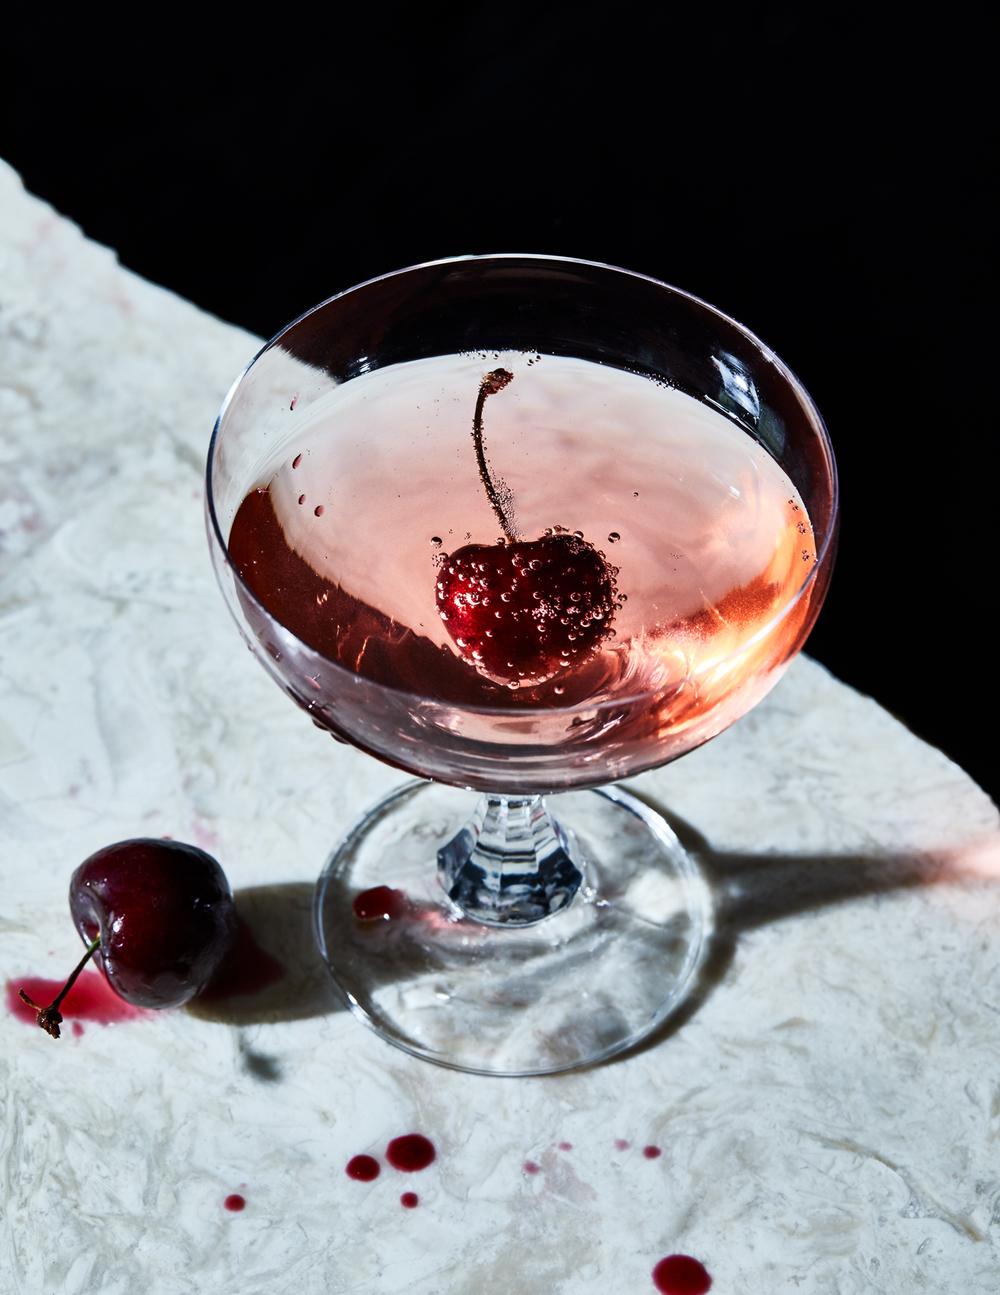 Gorgeous beverage image cherry bombe